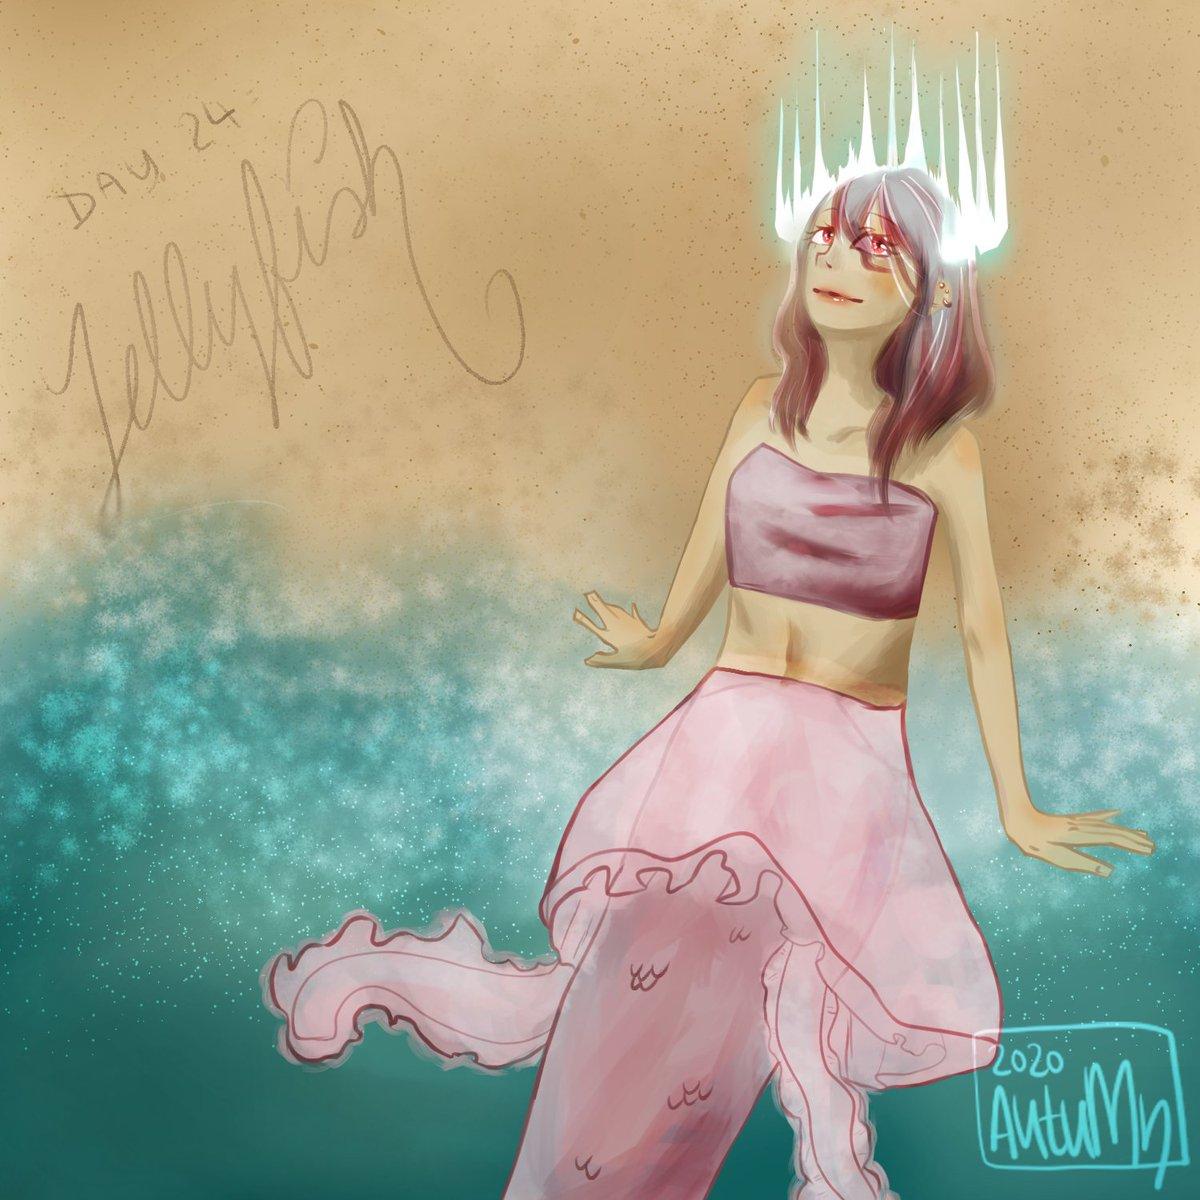 Day 24: jellyfish. Colours are hard pt 2. Nevermind trying to make backgrounds in detail yet... #illustrationartists #drawing #anime #만화 #manga #mermay #漫画 #myartwork #doodle #dailydoodle #digitaldoodle #digitalillustration #artoftheday #落書き #イラスト #animemangapic.twitter.com/JgEddMWZRB